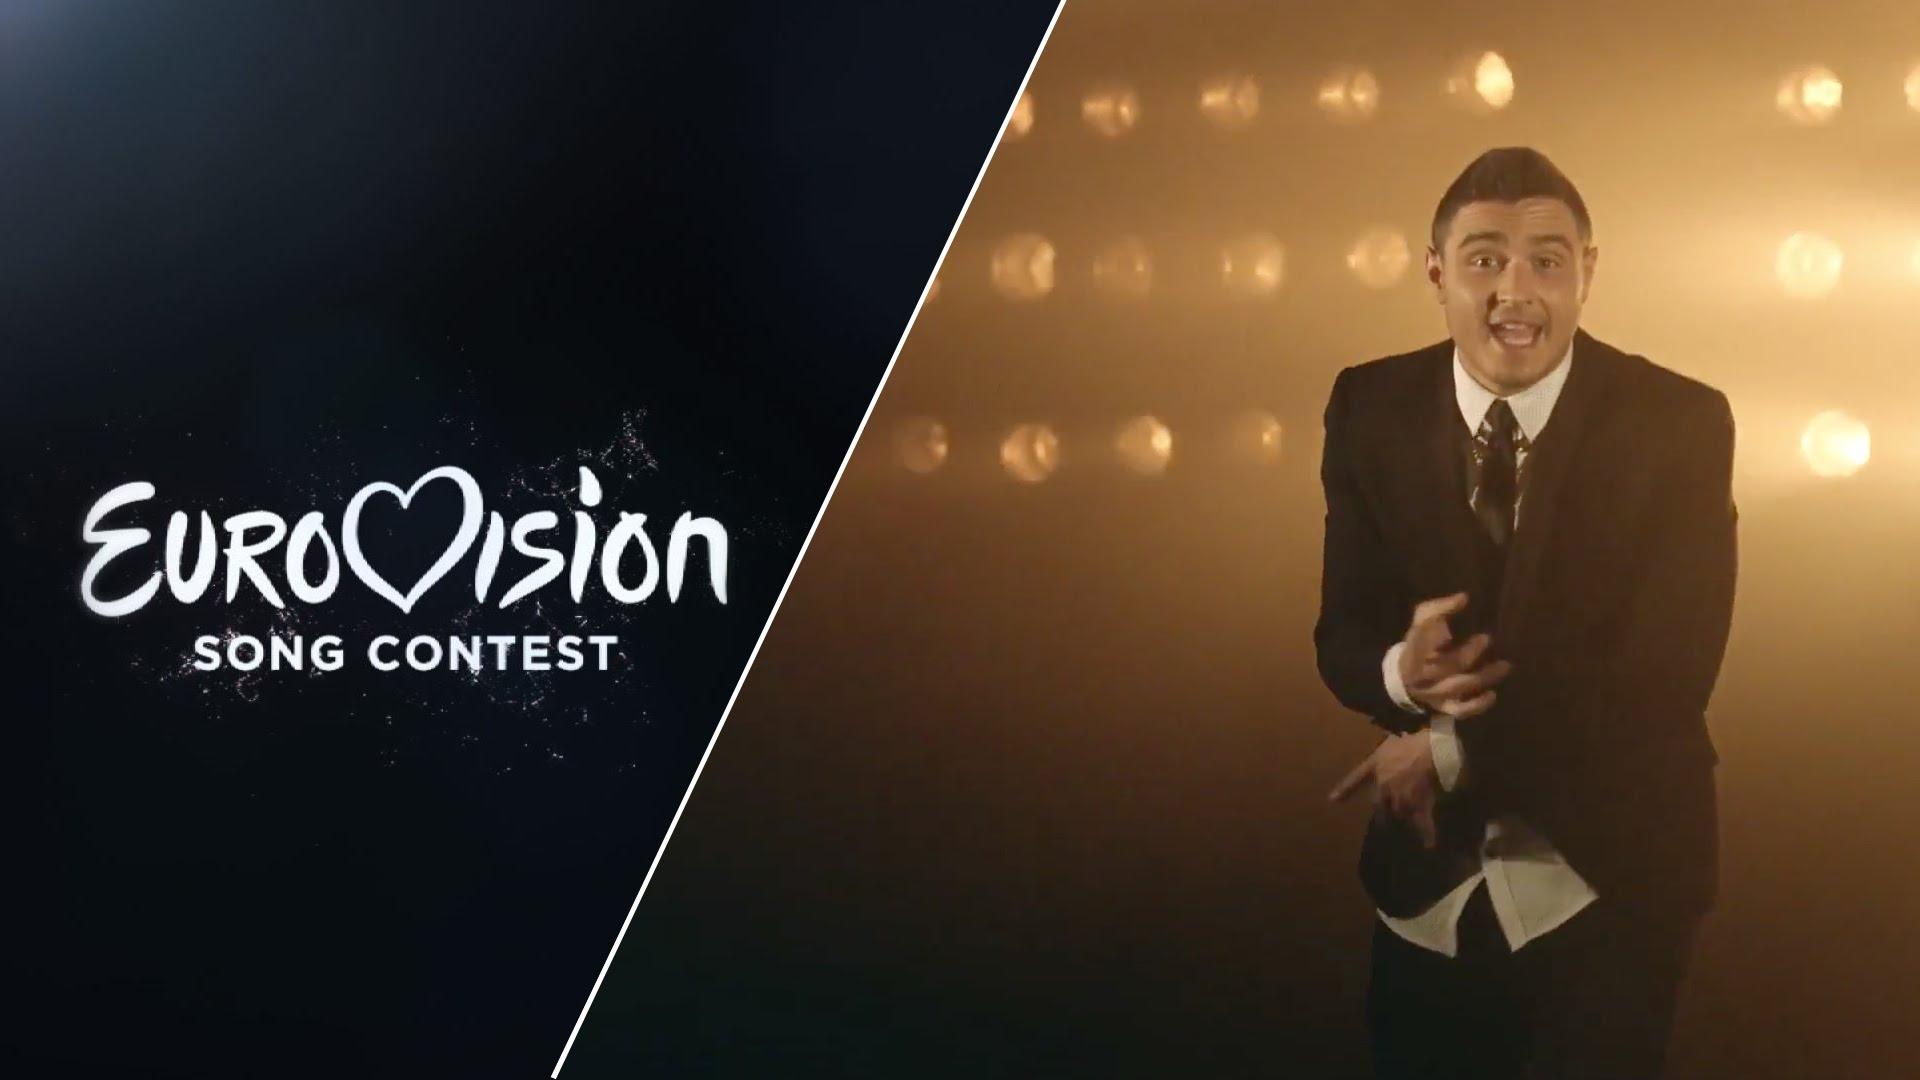 Nadav Guedj - Golden Boy (Israel) 2015 Eurovision Song Contest